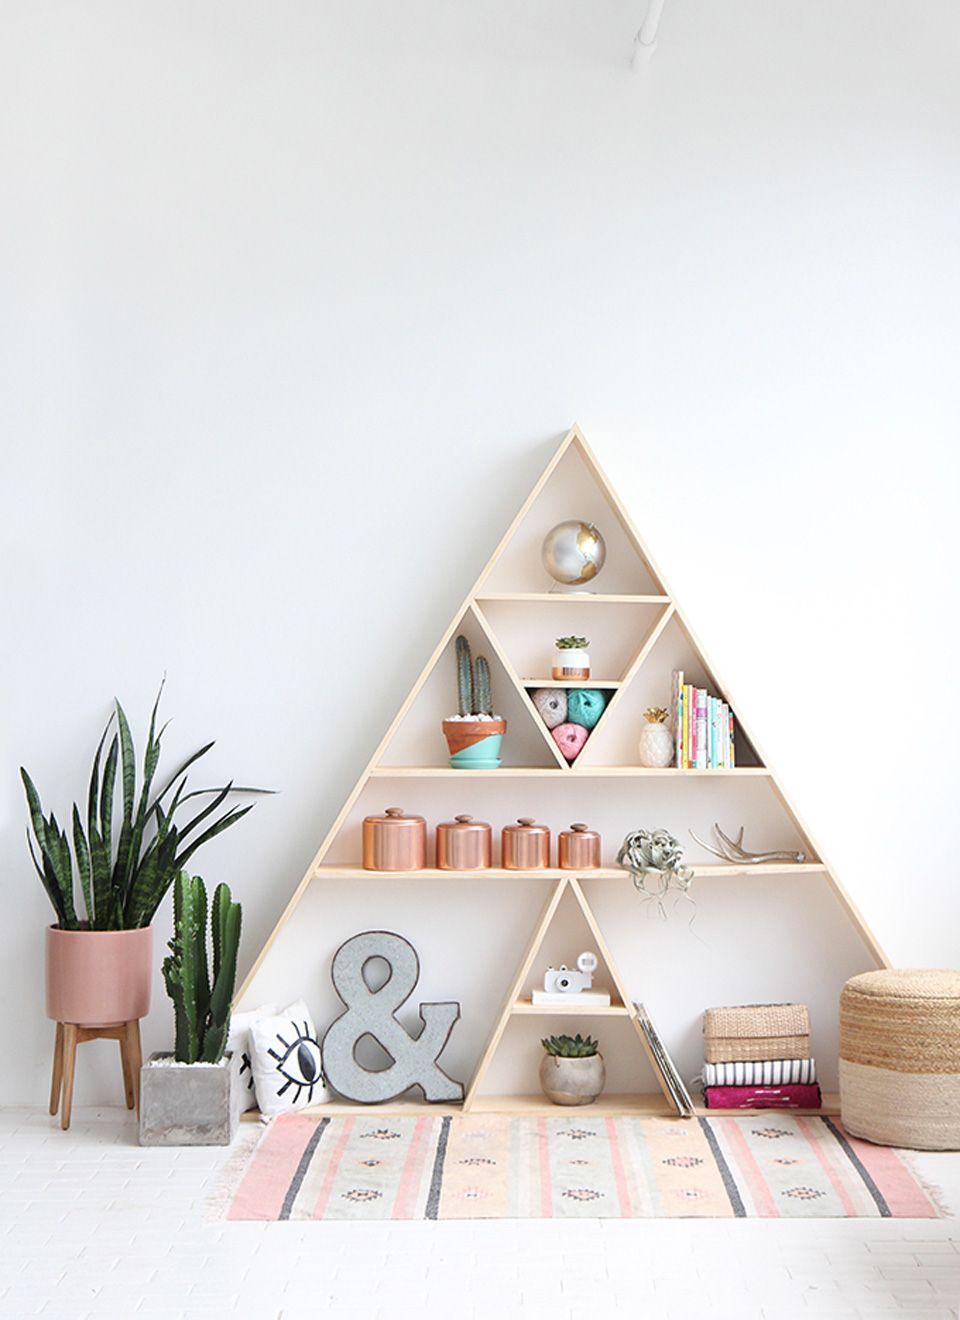 8 id es diy pour la d co de votre chambre idee diy la deco et diy d co chambre. Black Bedroom Furniture Sets. Home Design Ideas